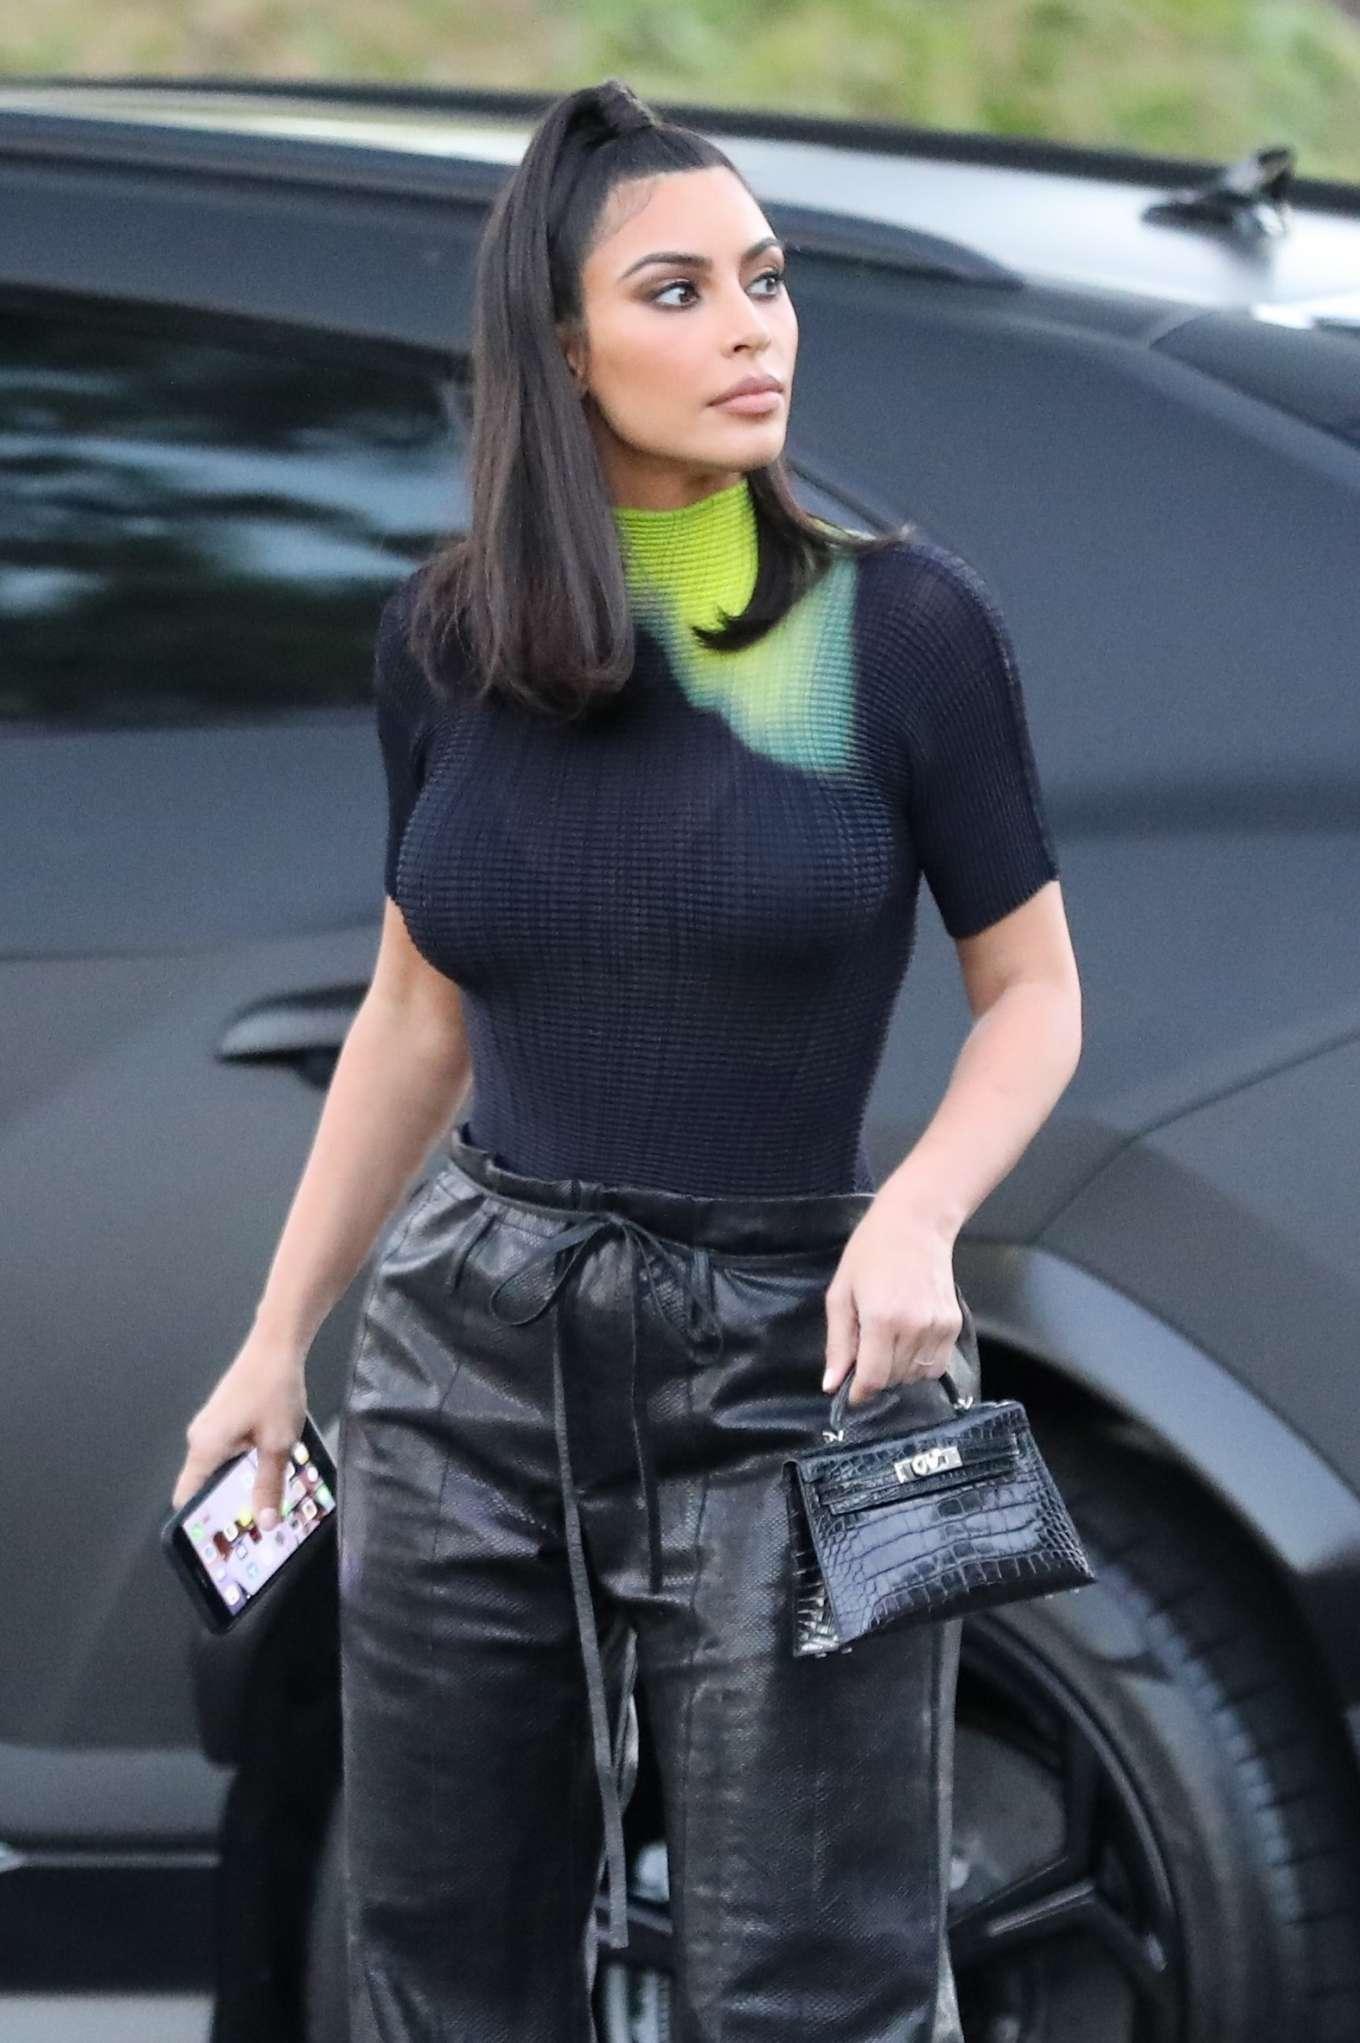 Kim Kardashian - Arrives at the Commons Shopping Mall in Calabasas